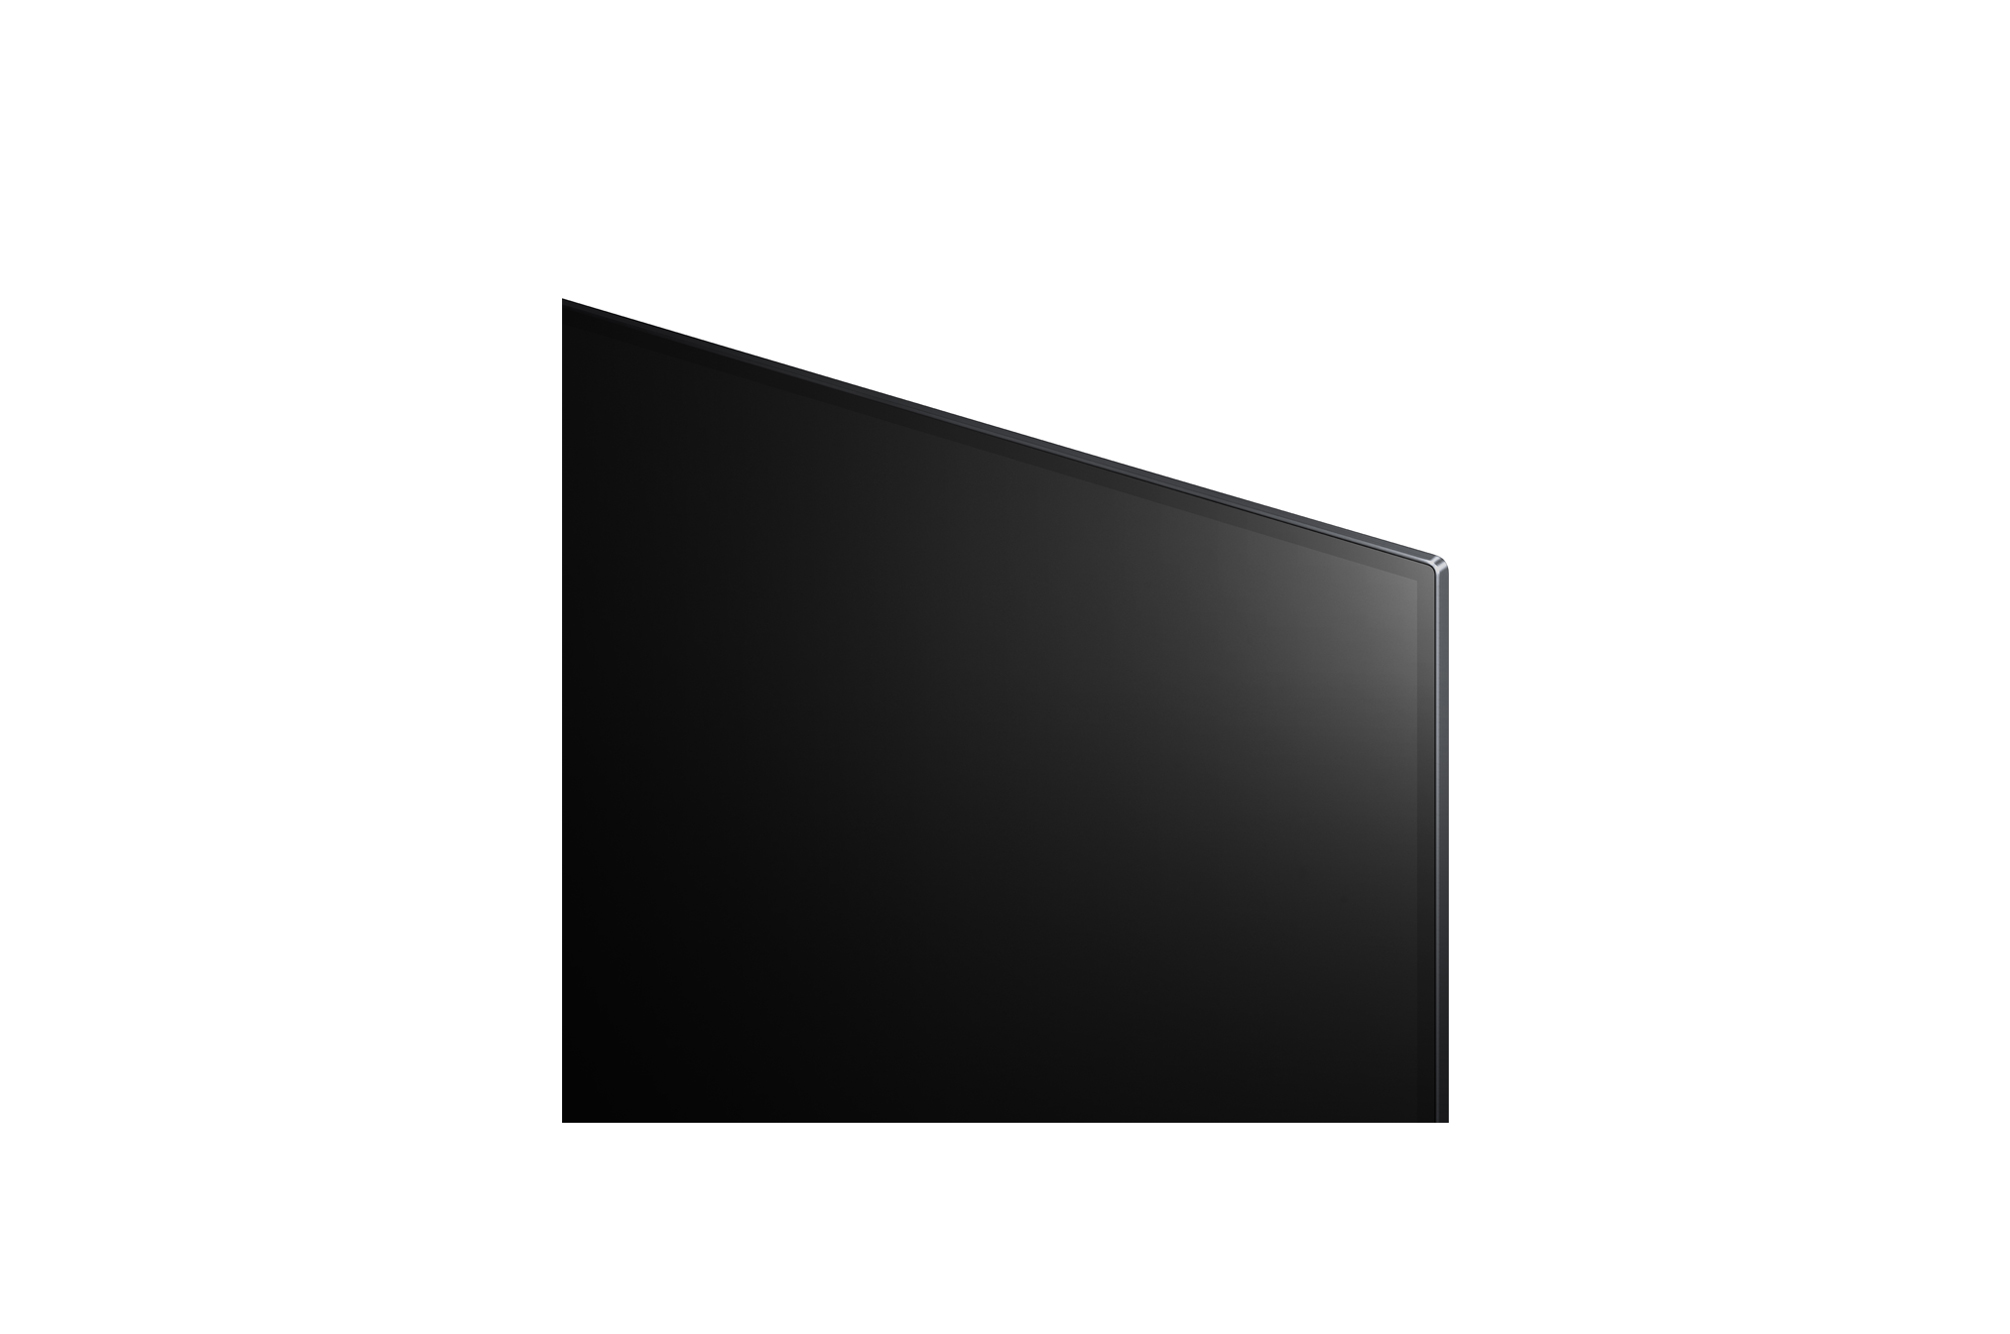 LG Pro:Centric SMART 65WS960H (EU) 9